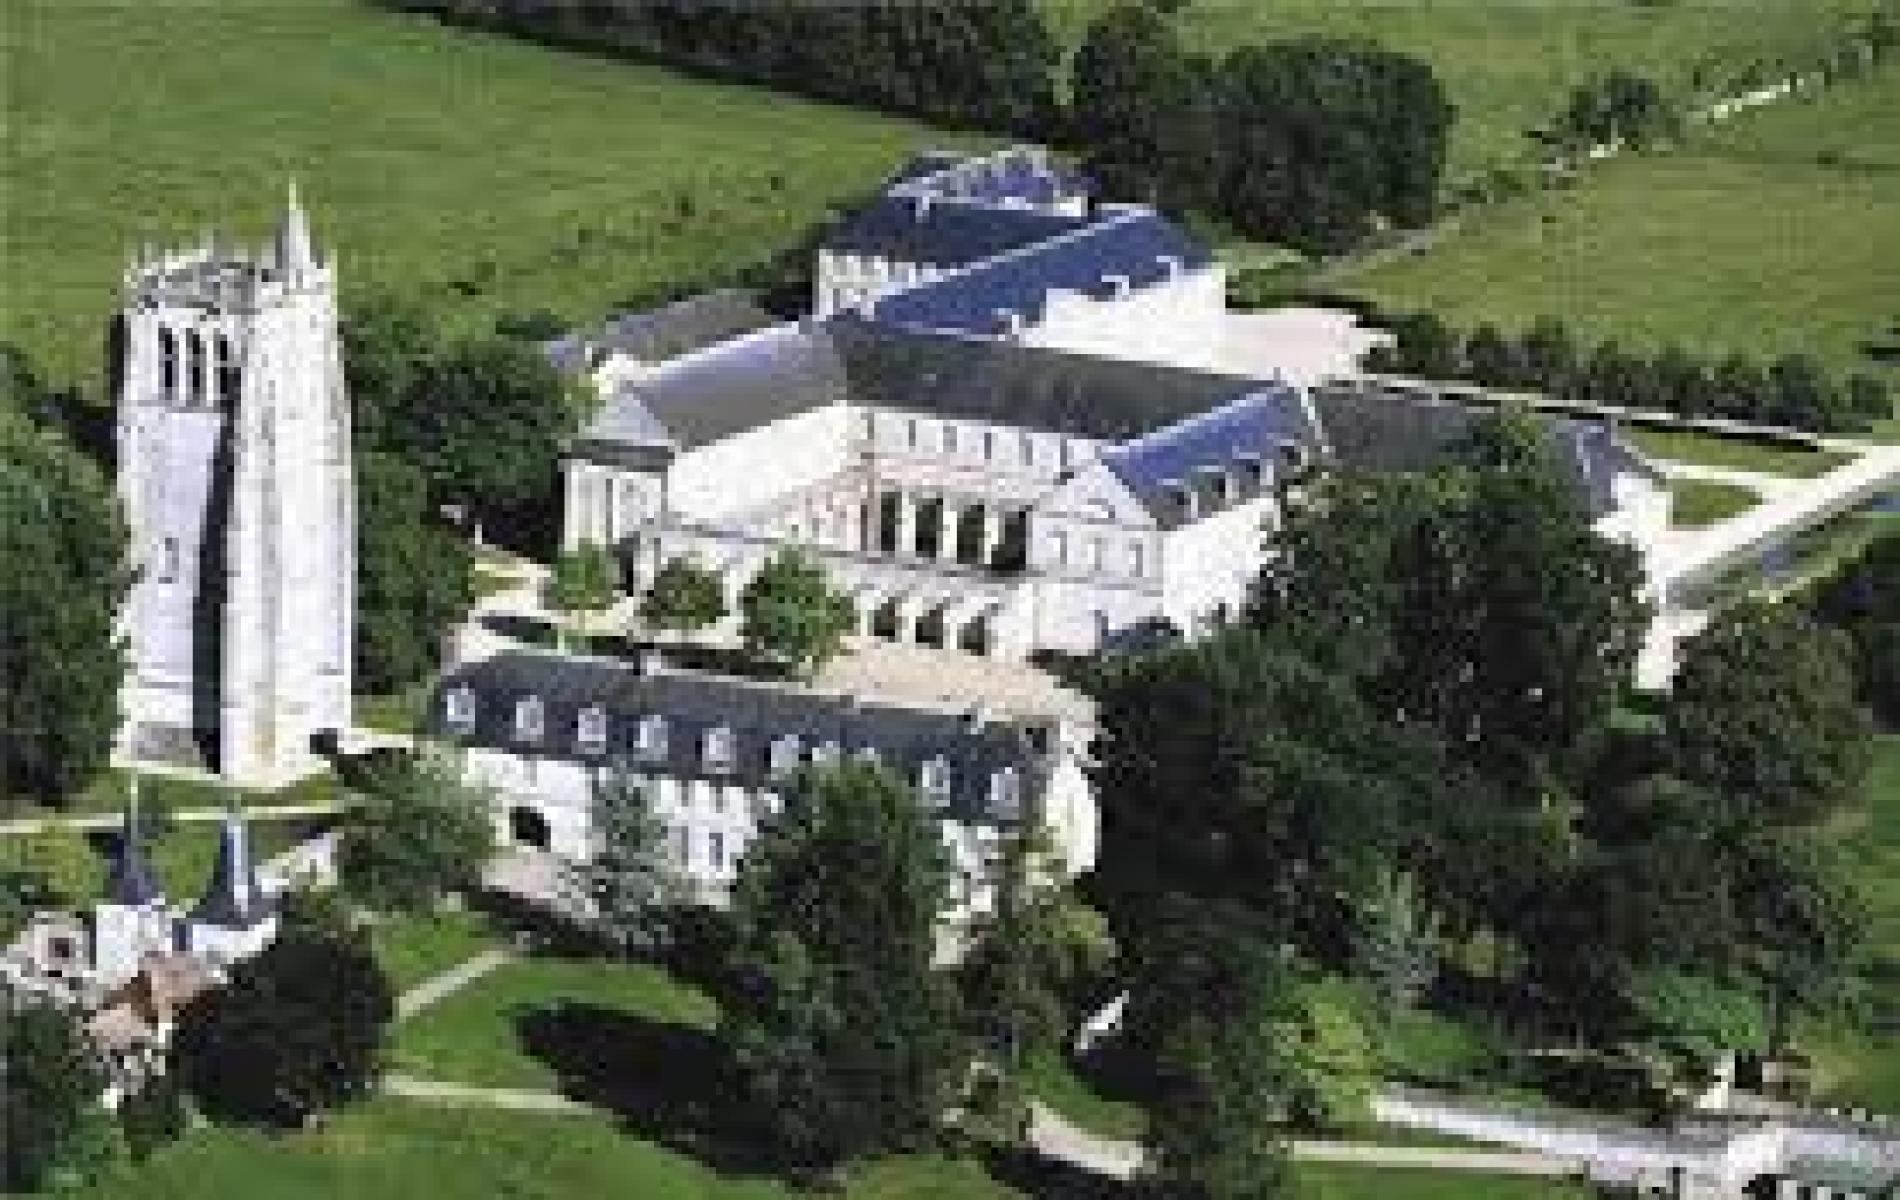 L'abbaye du Bec Hellouin